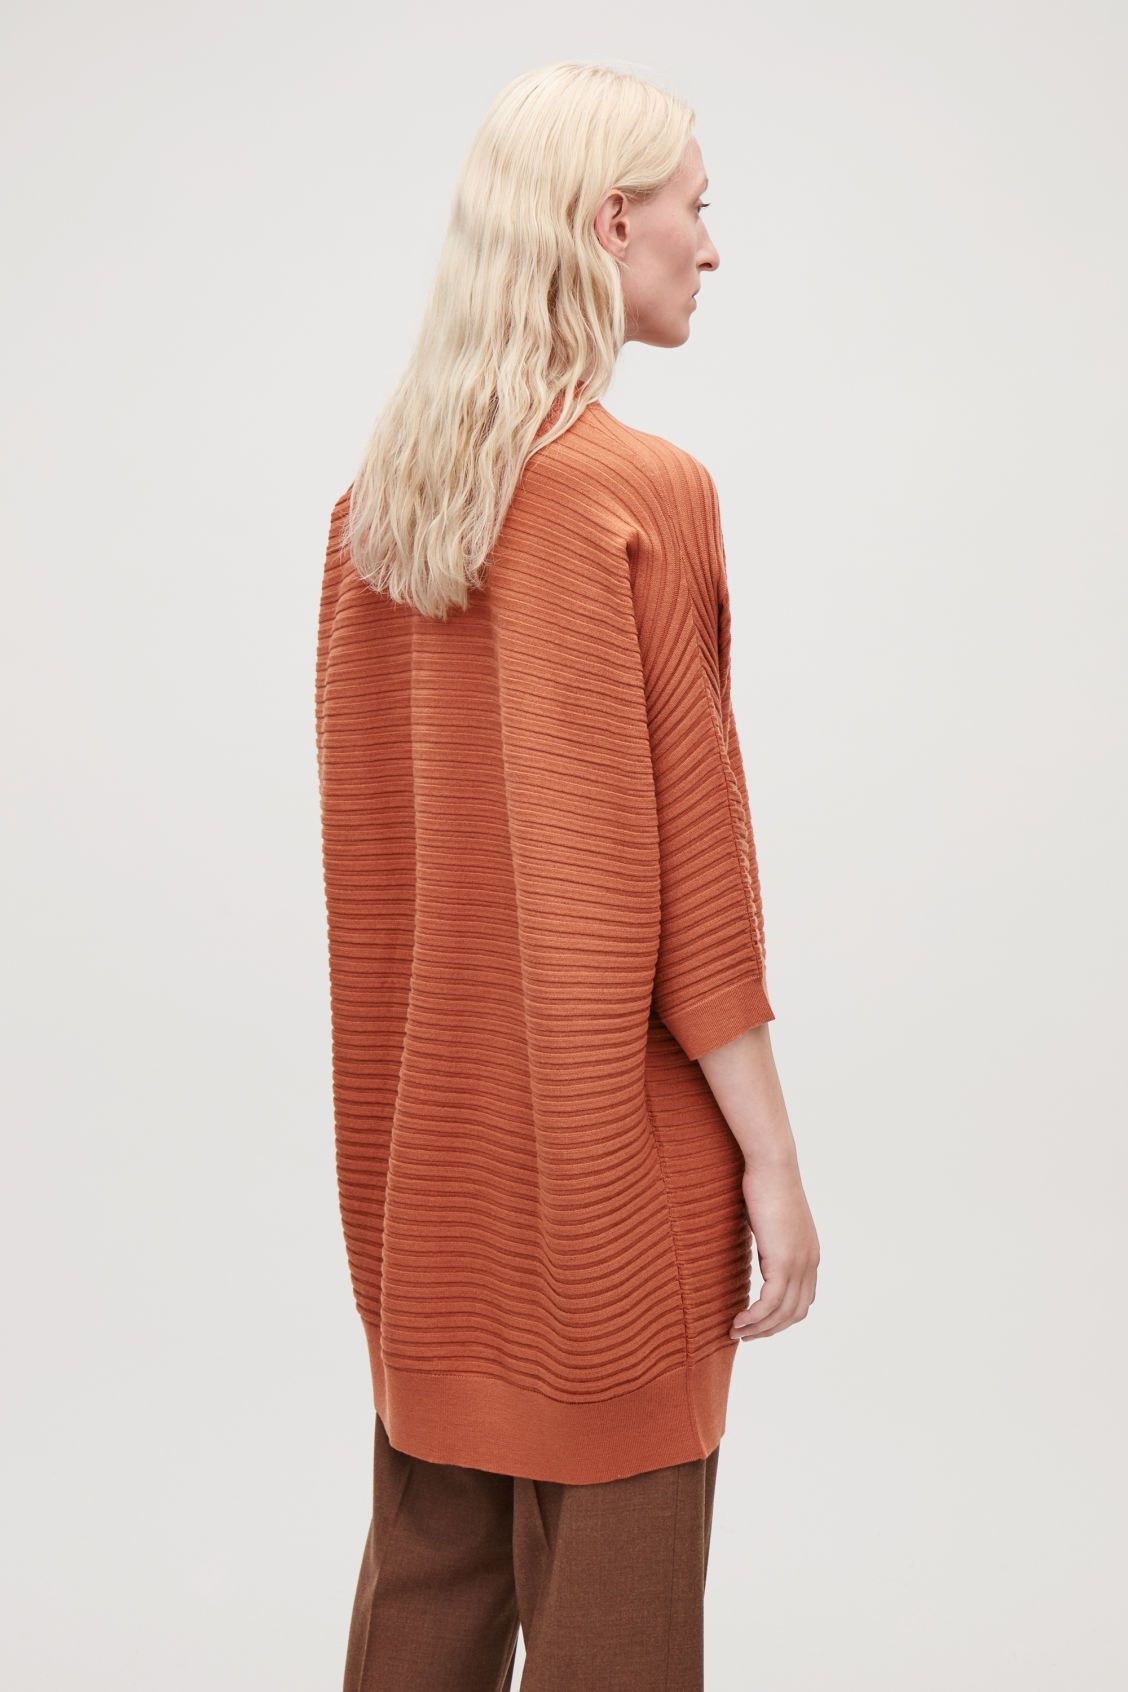 Cos green dress 2018  Model side image of Cos voluminous wool ribknit dress in orange